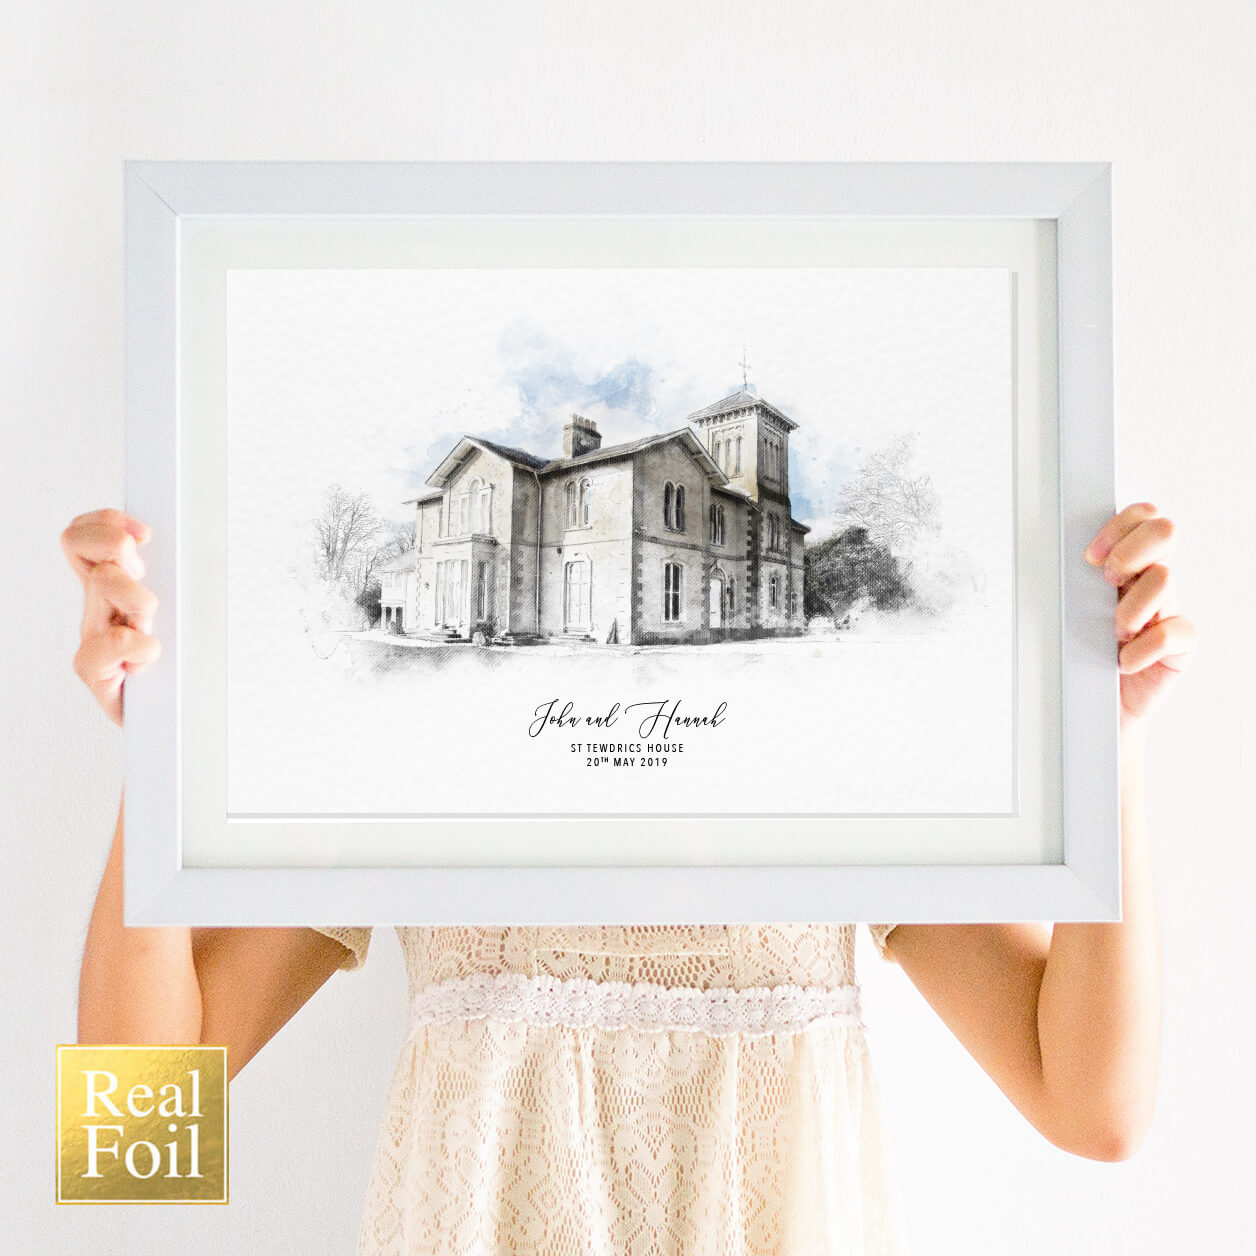 foil wedding venue illustration print